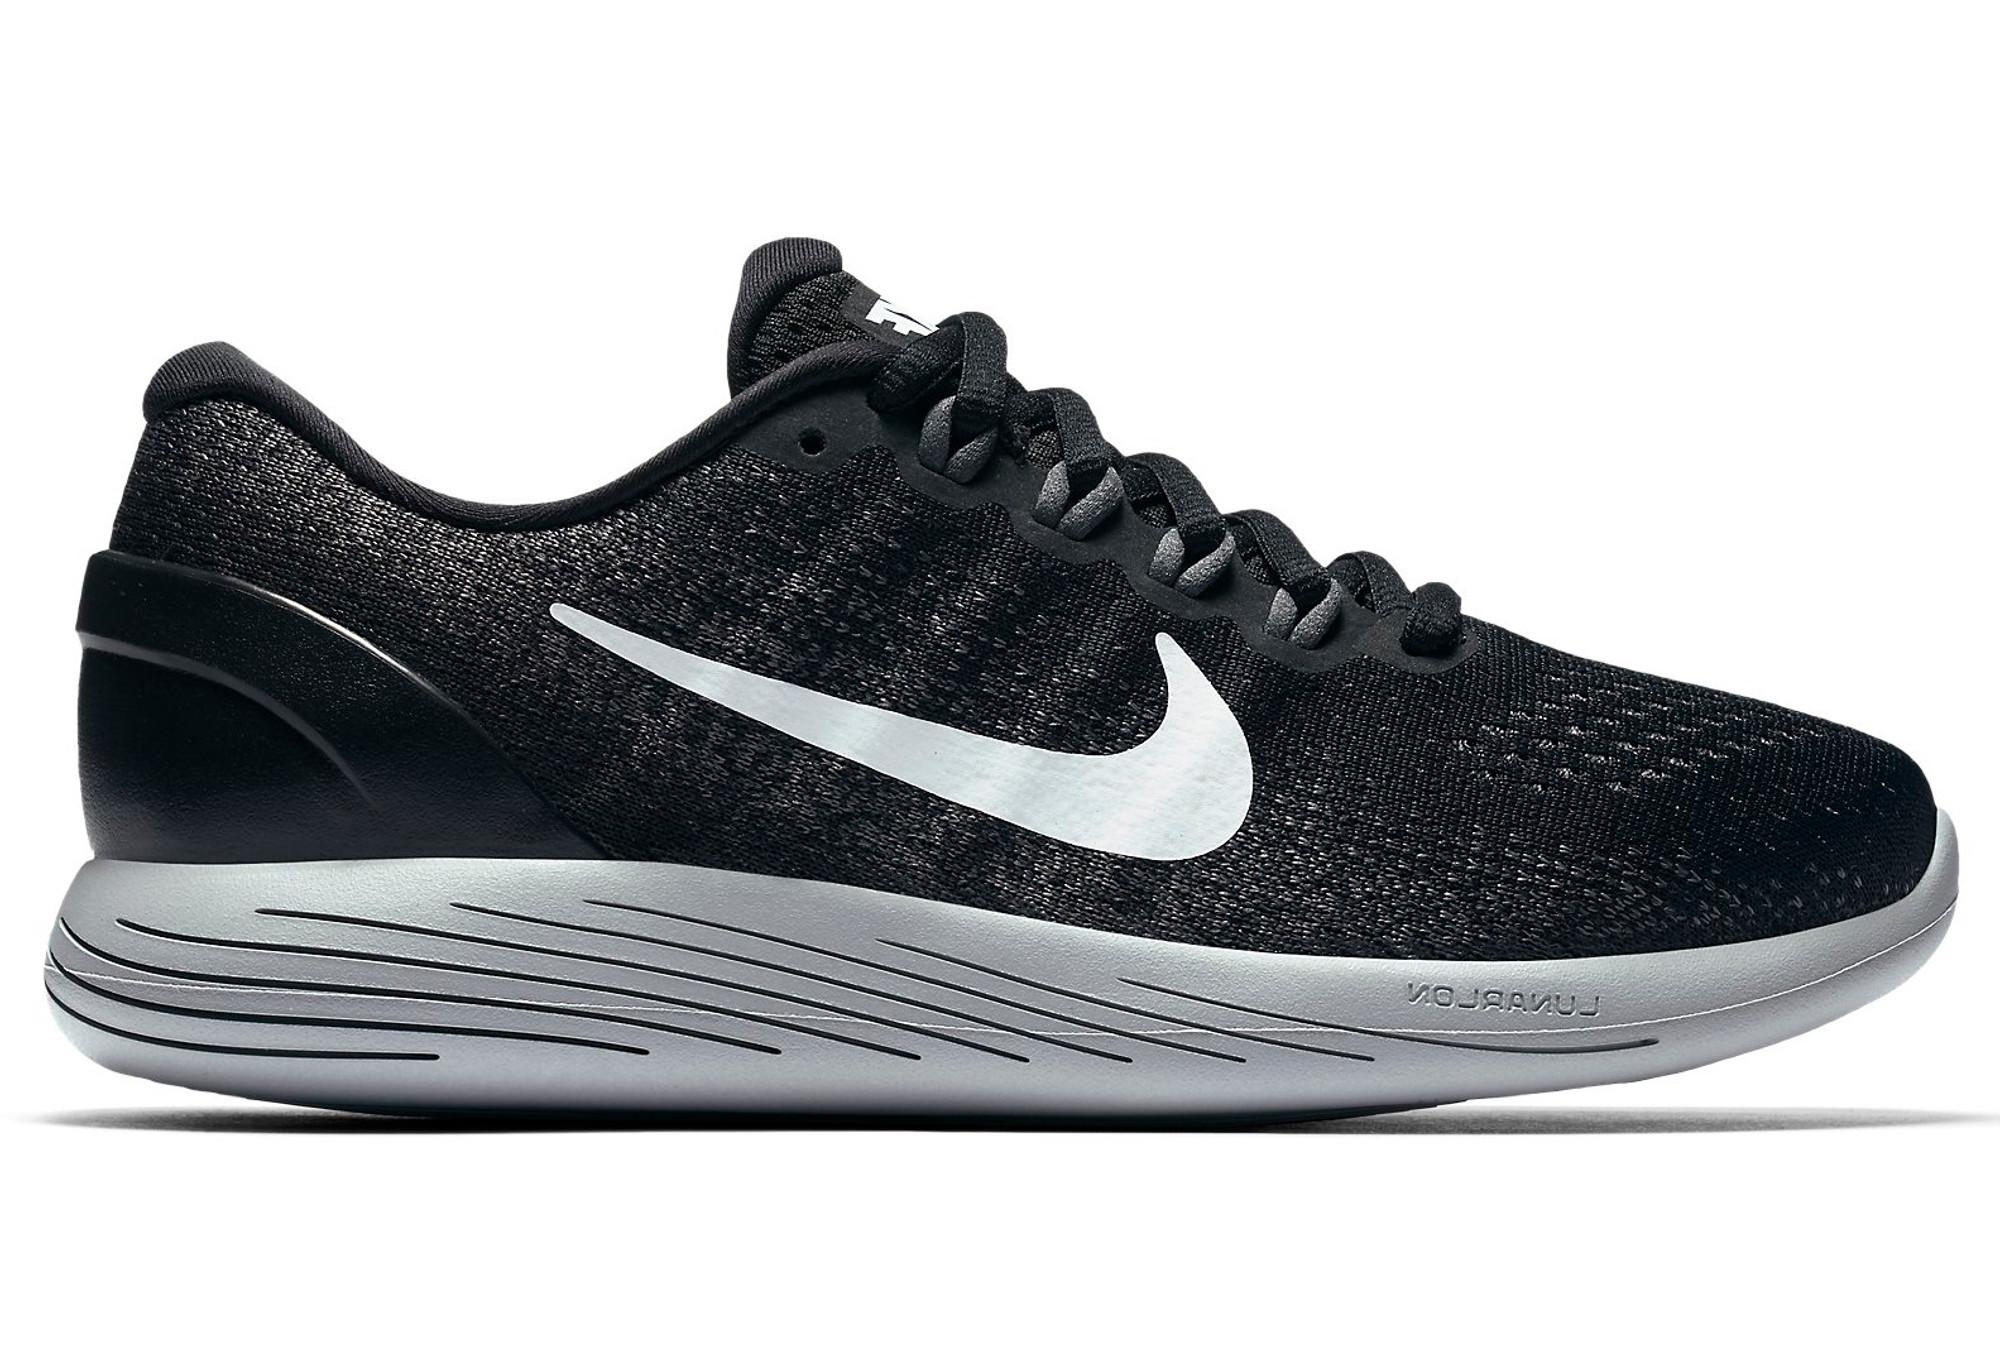 Mujeres Nike es Alltricks 9 Negro Lunarglide EwwZFq0